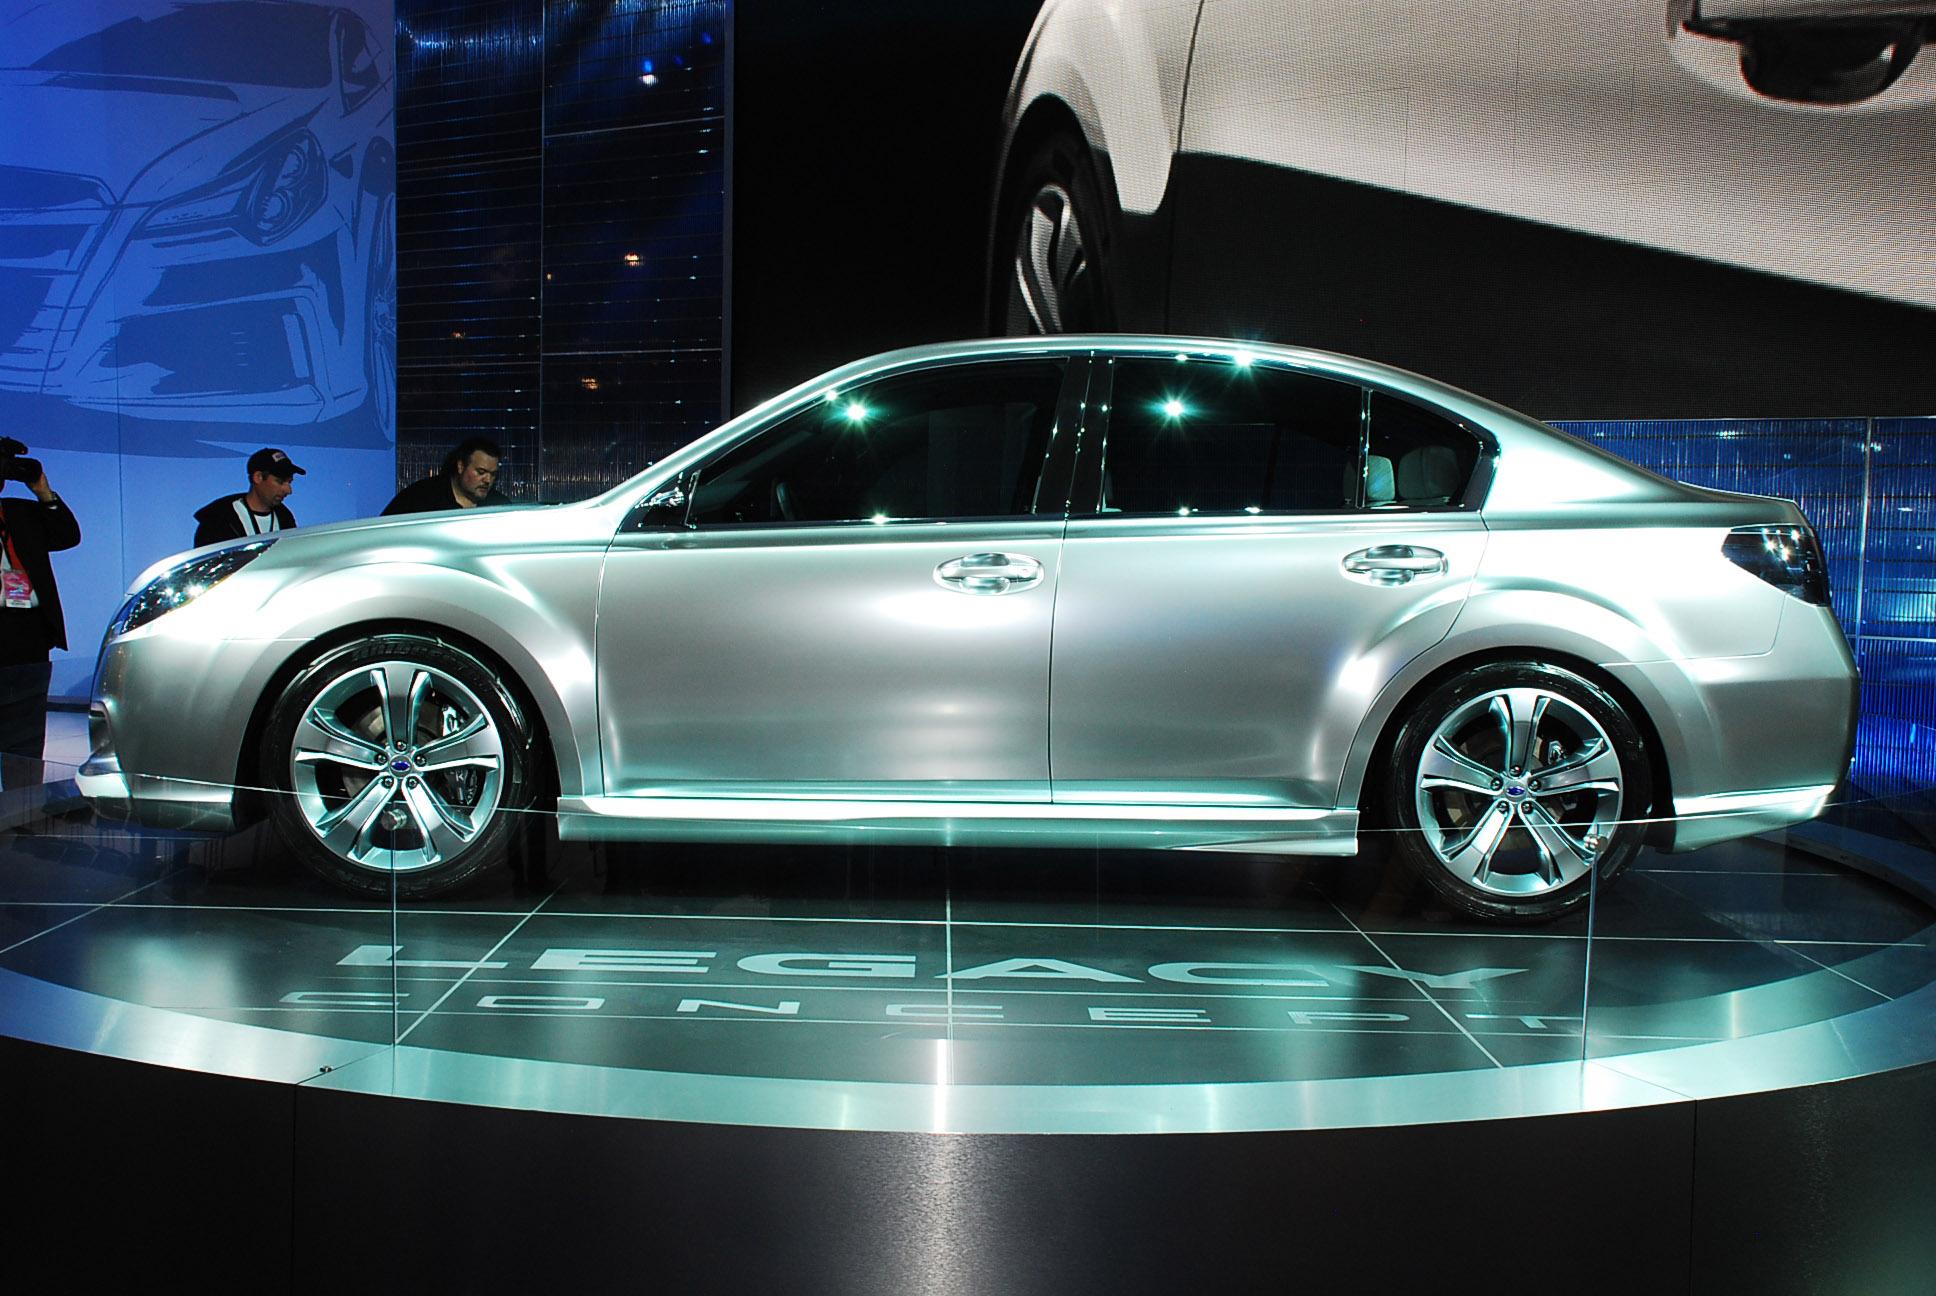 Hyundai hnd 9 concept sketch subaru legacy concept detroit 2009 vanachro Image collections